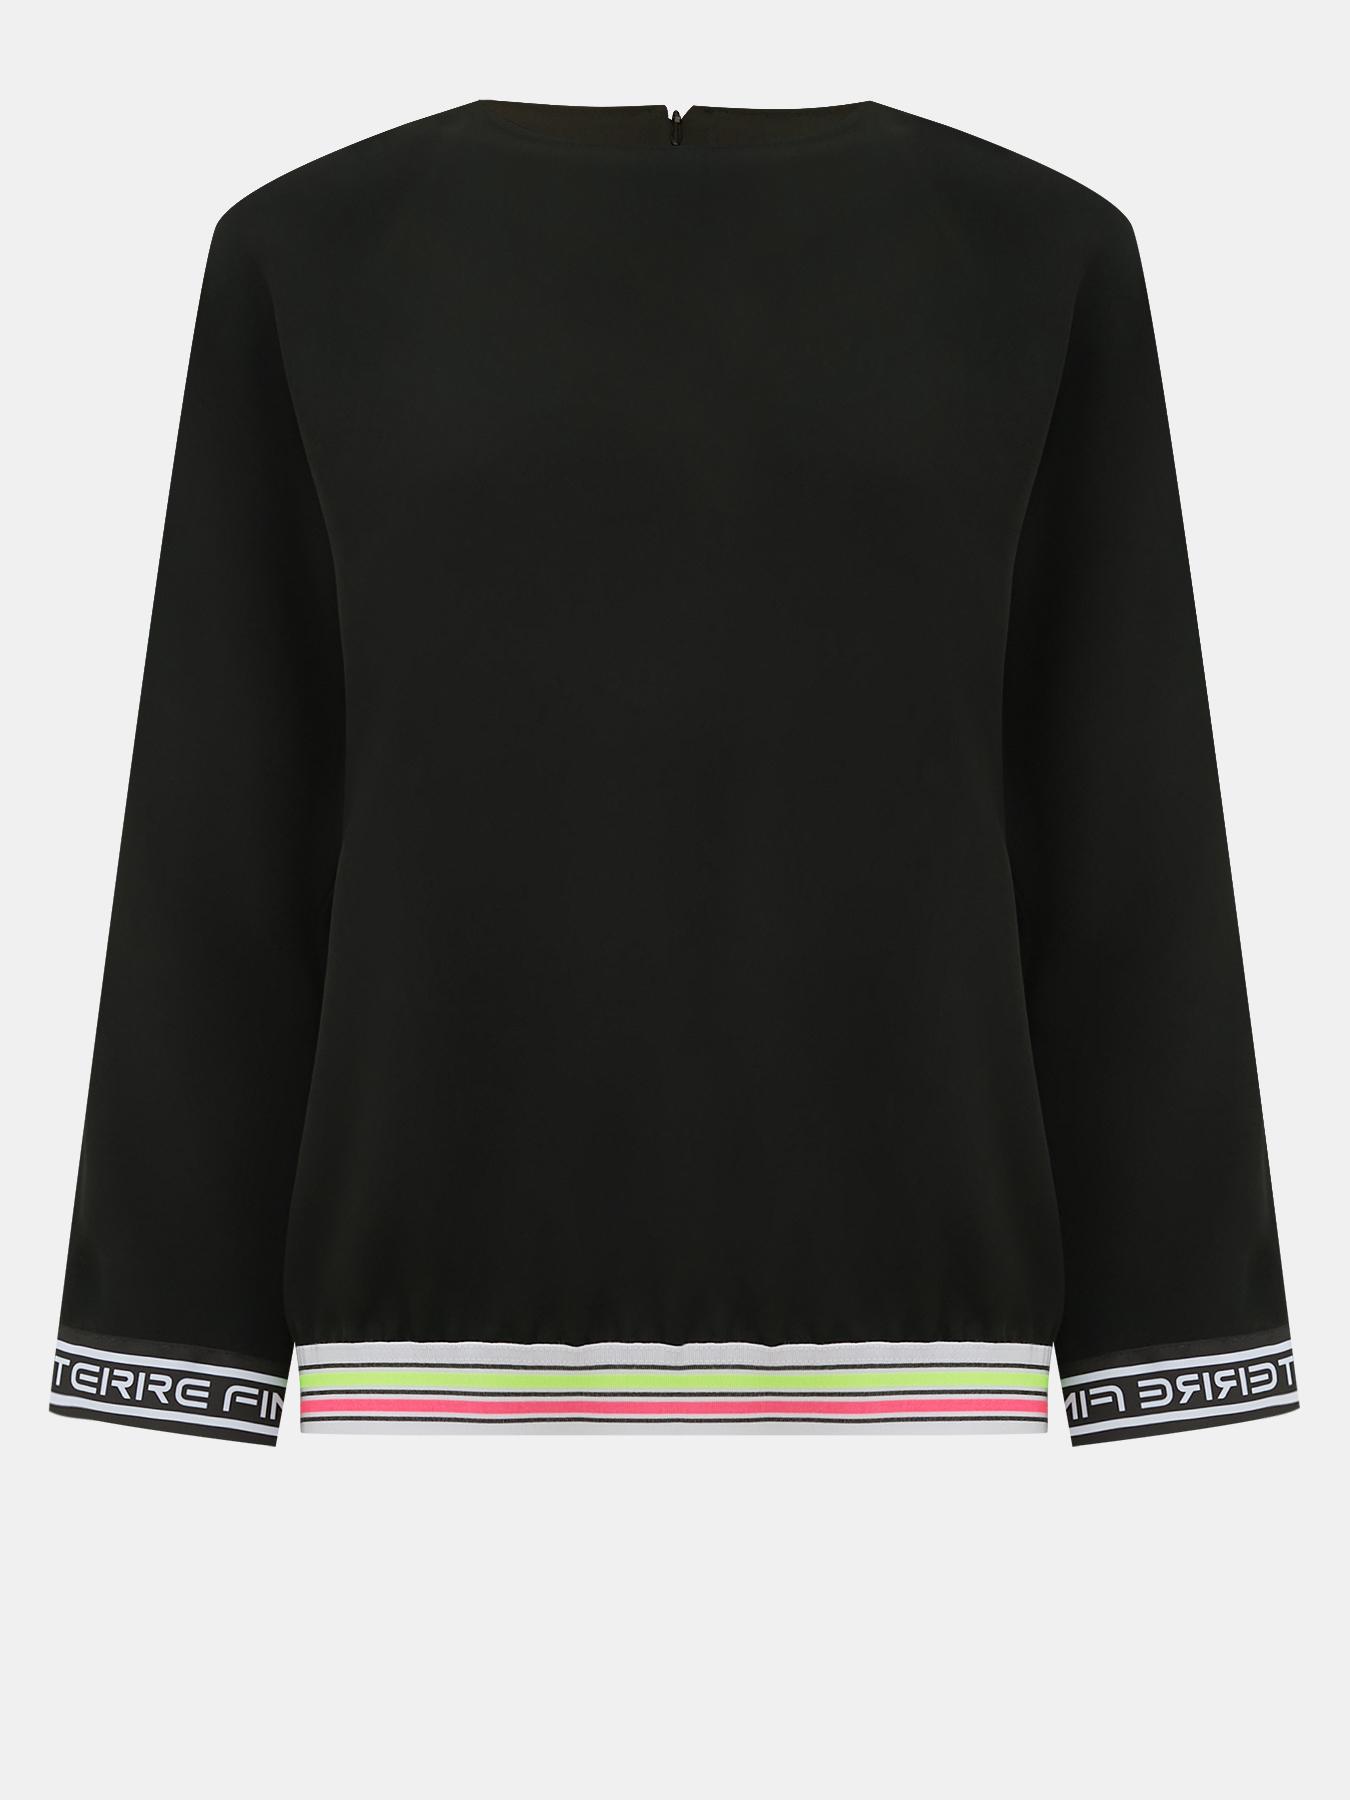 Блузки Finisterre Блузка блузка helmidge блузка